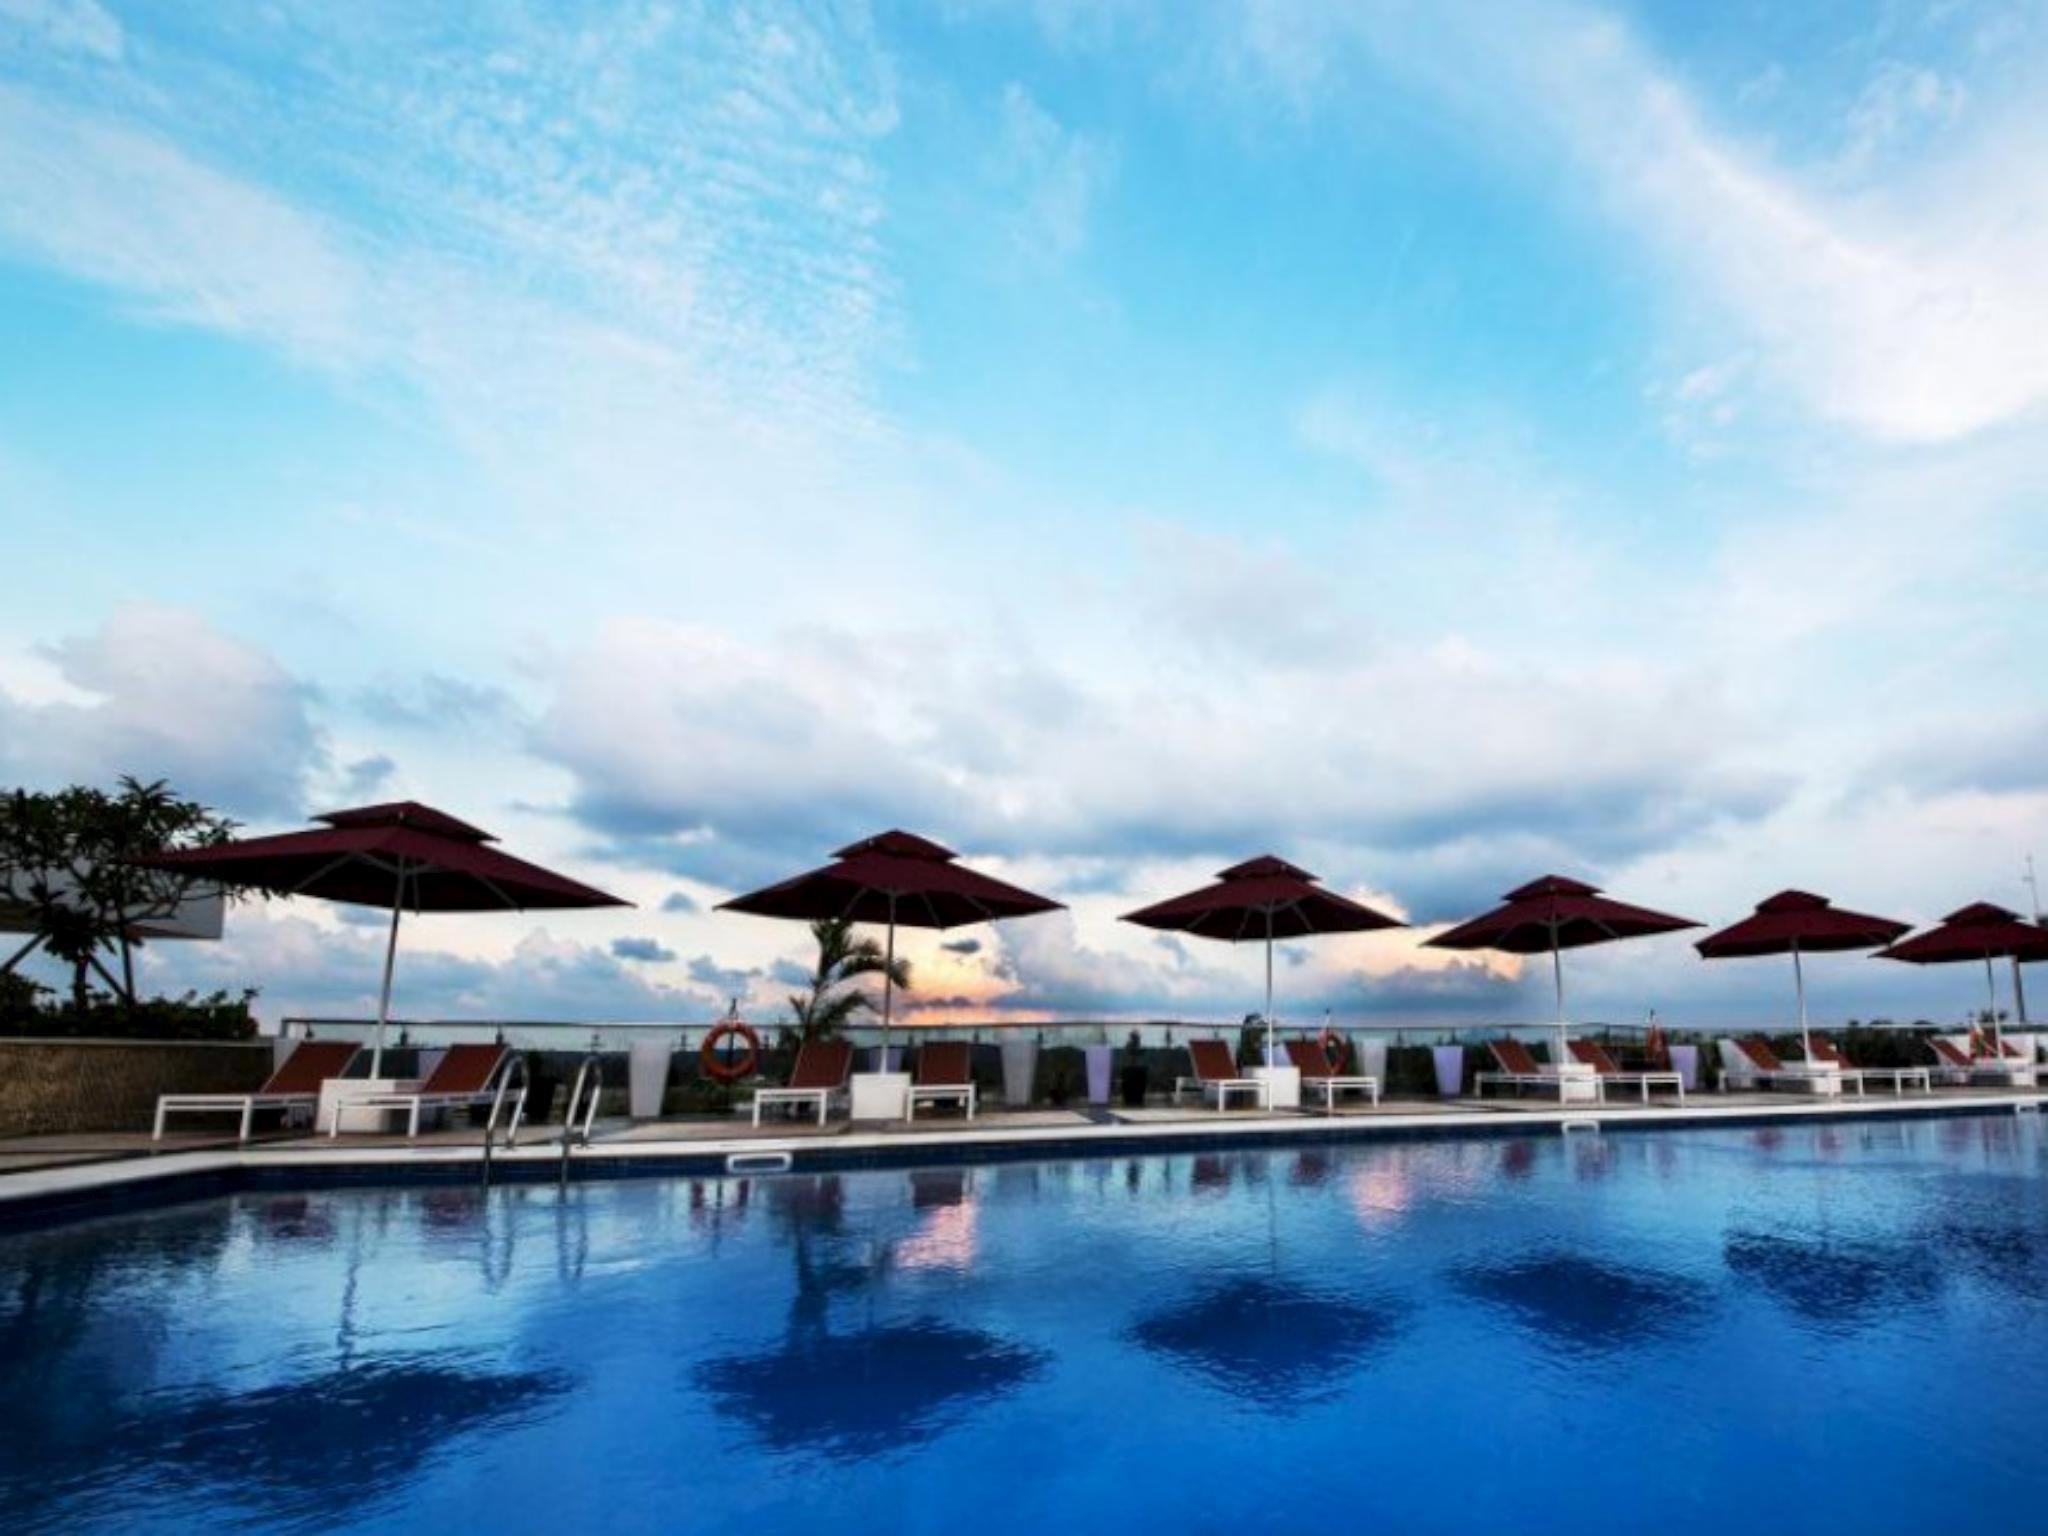 Al Muhaideb Hafr Al Batin Hotel Bintan Island Swiss Belhotel Lagoi Bay Bintan Indonesia Asia